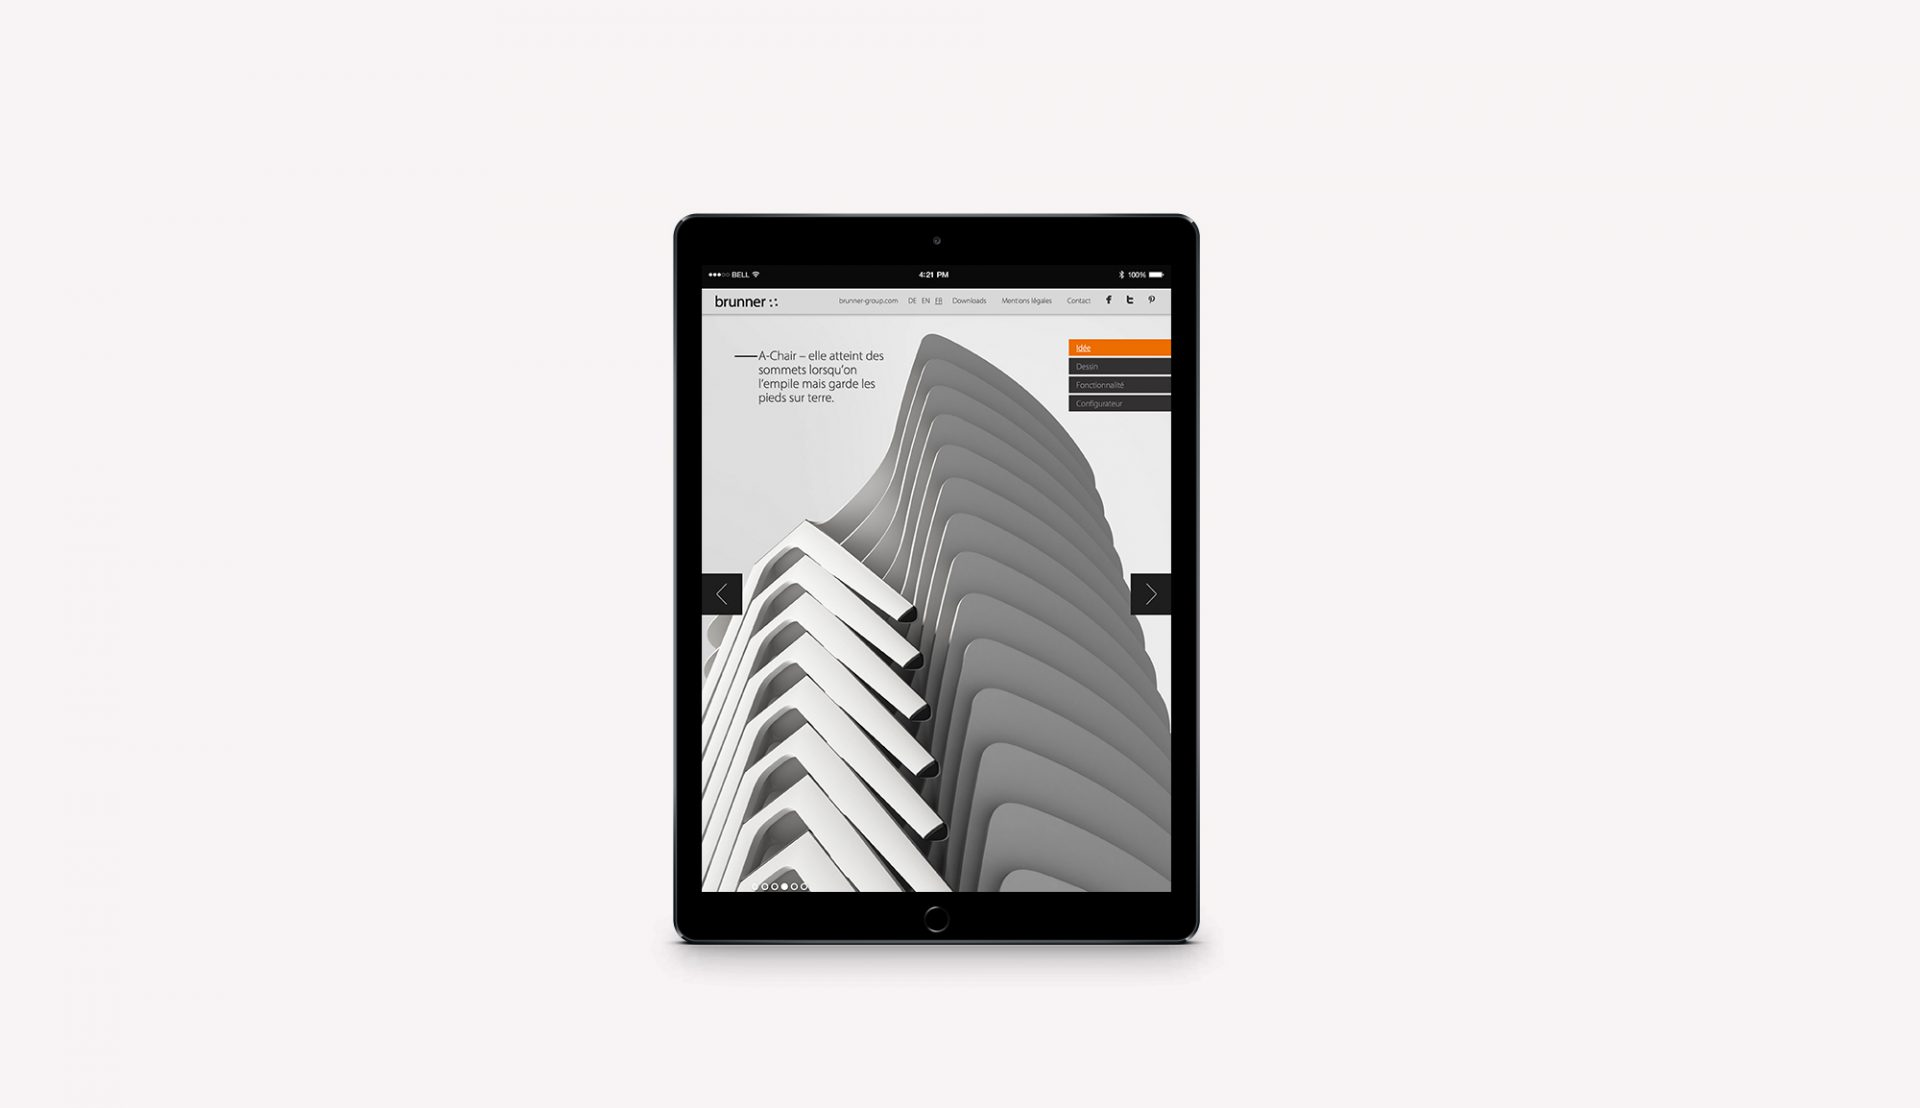 Brunner Sales Communication Microsite